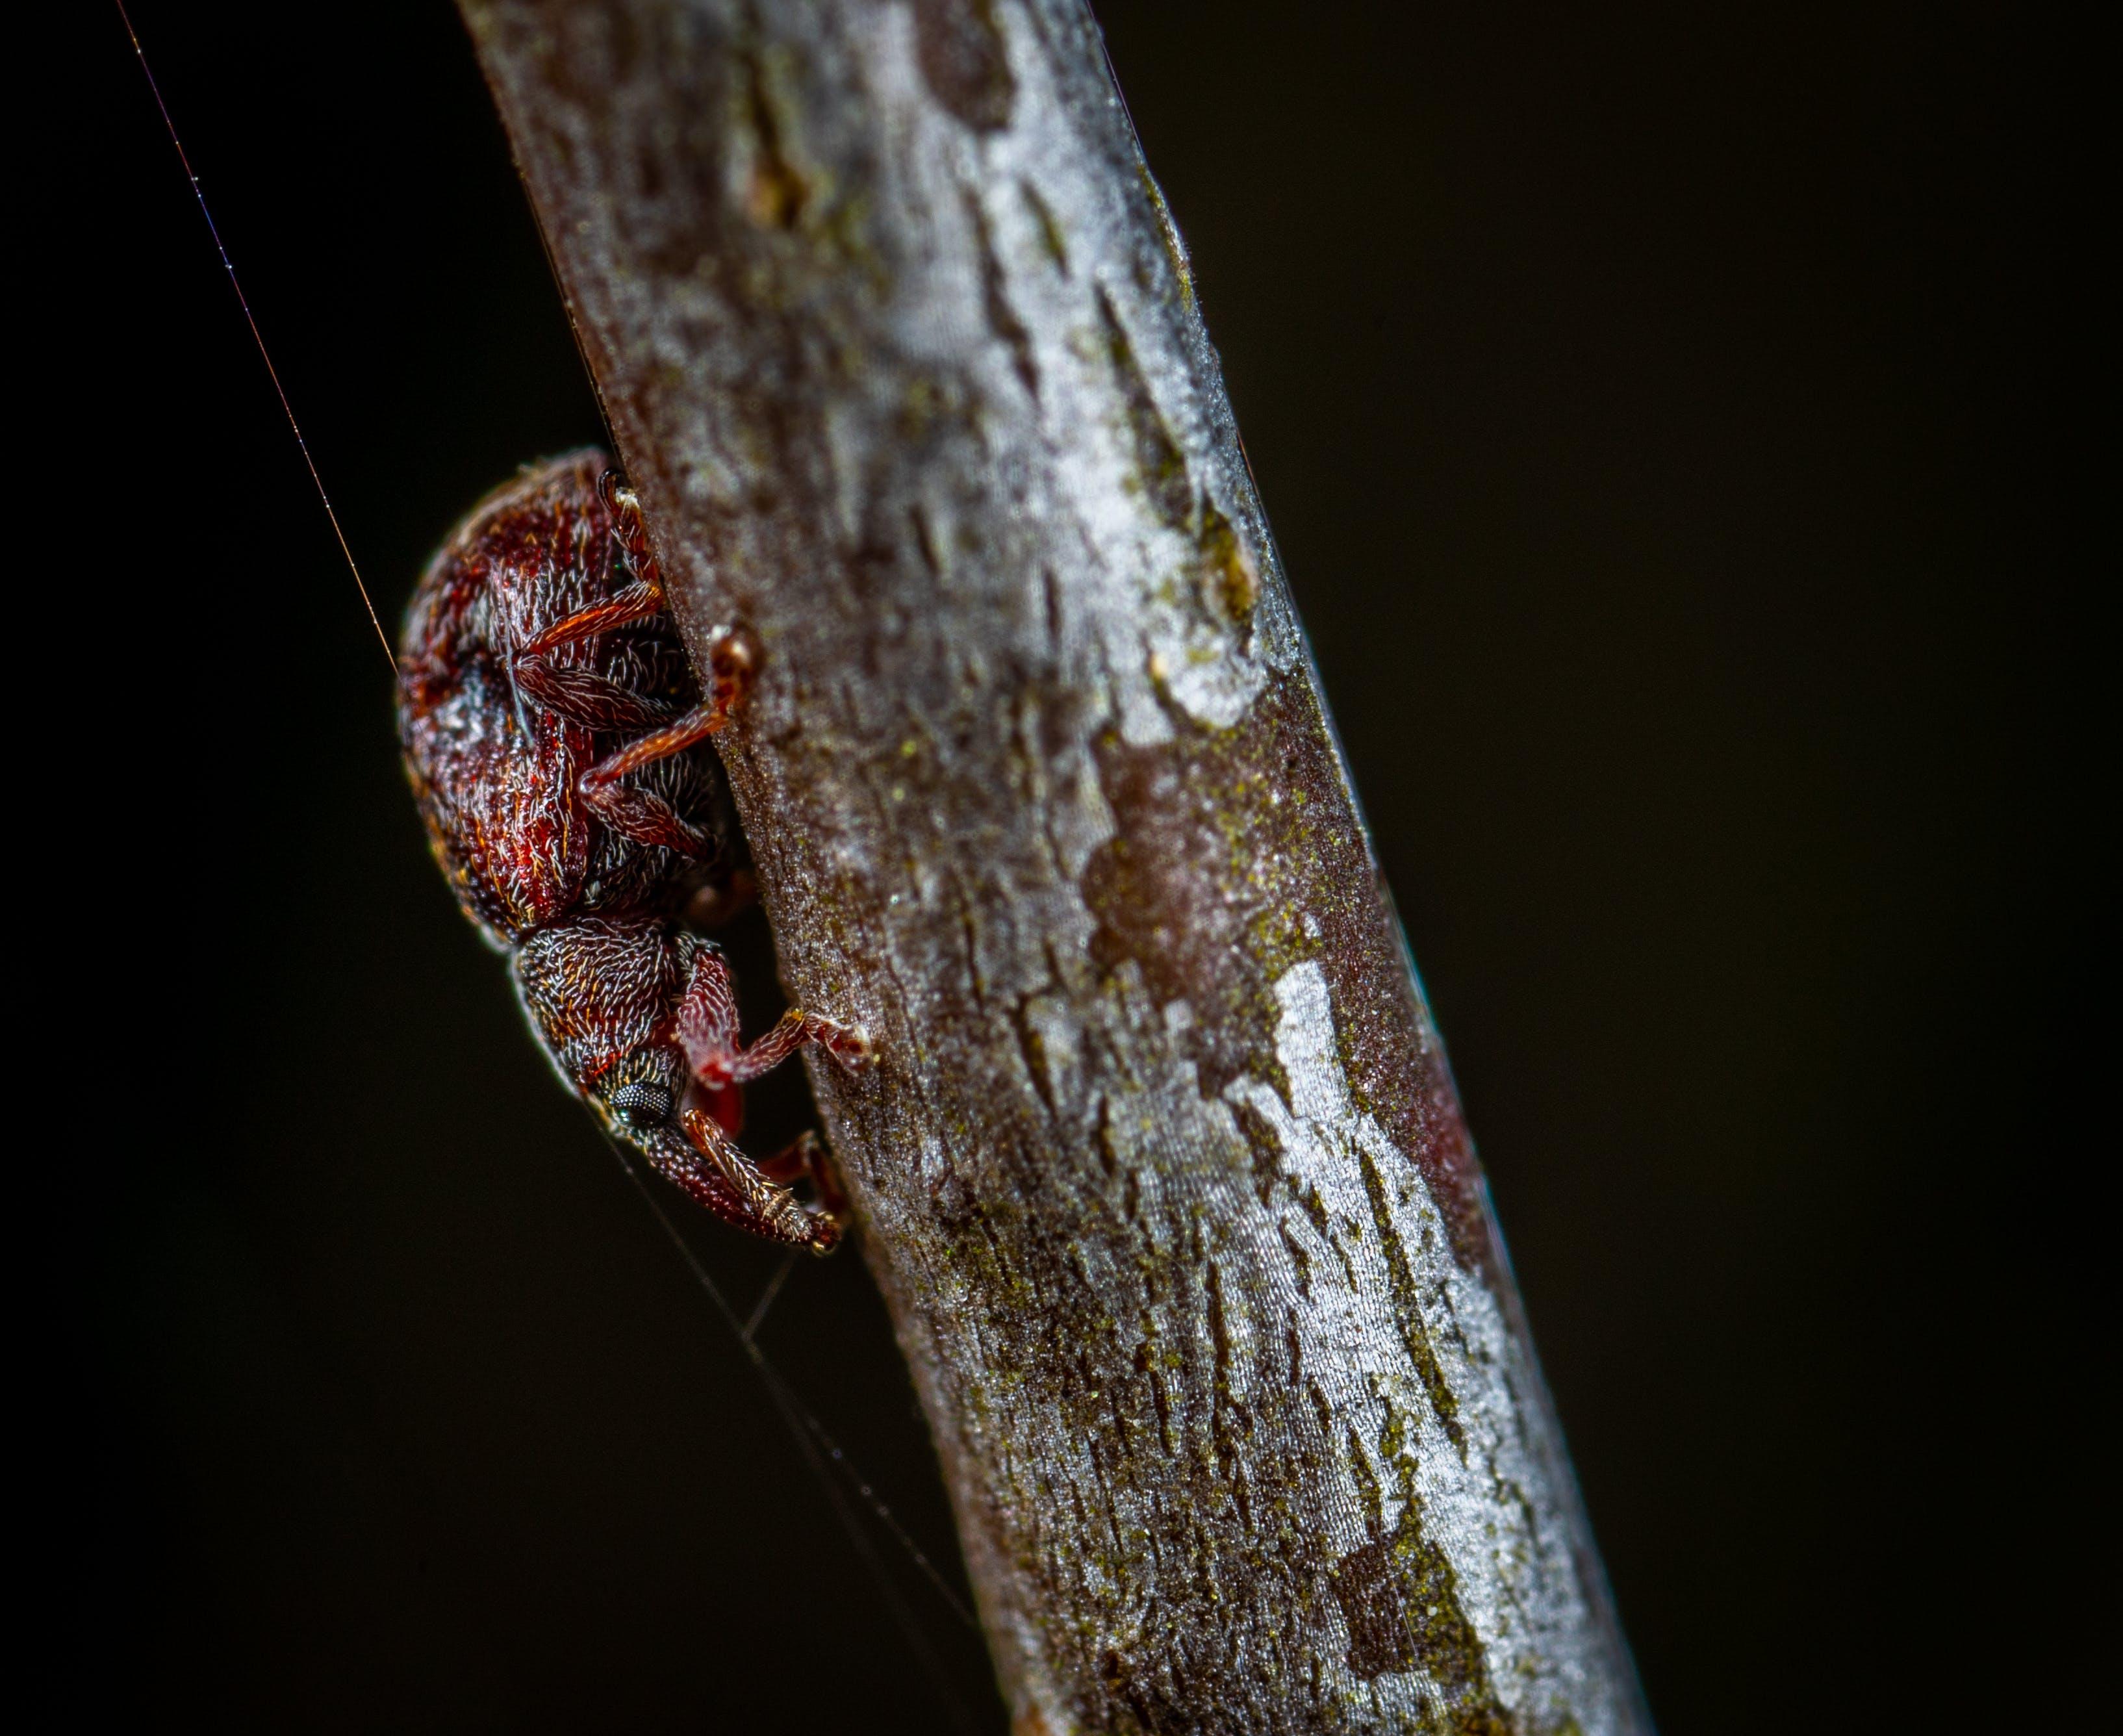 Macro Photo of Red Tree Hopper on Brown Wooden Stem